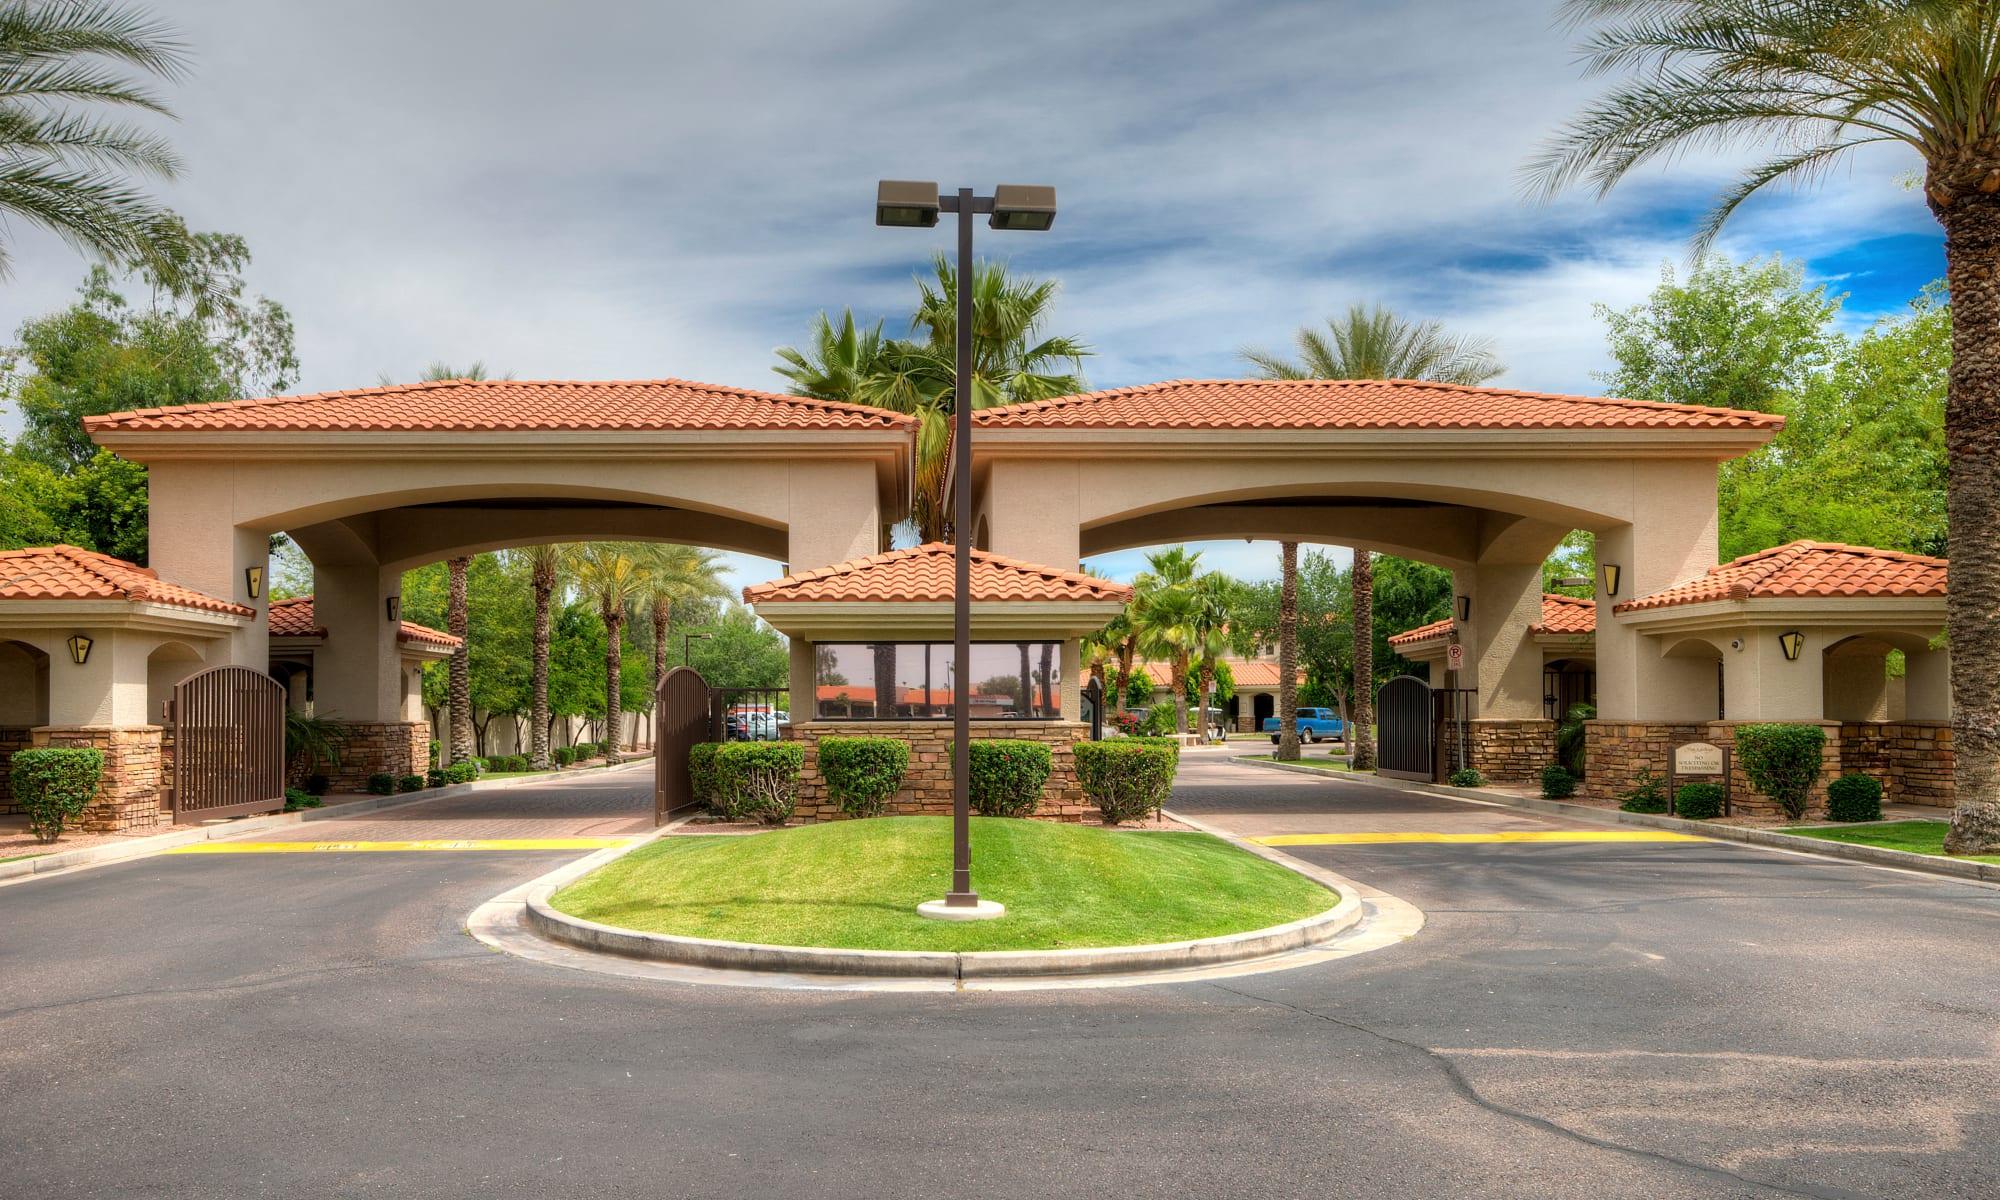 Apartments at San Hacienda in Chandler, Arizona